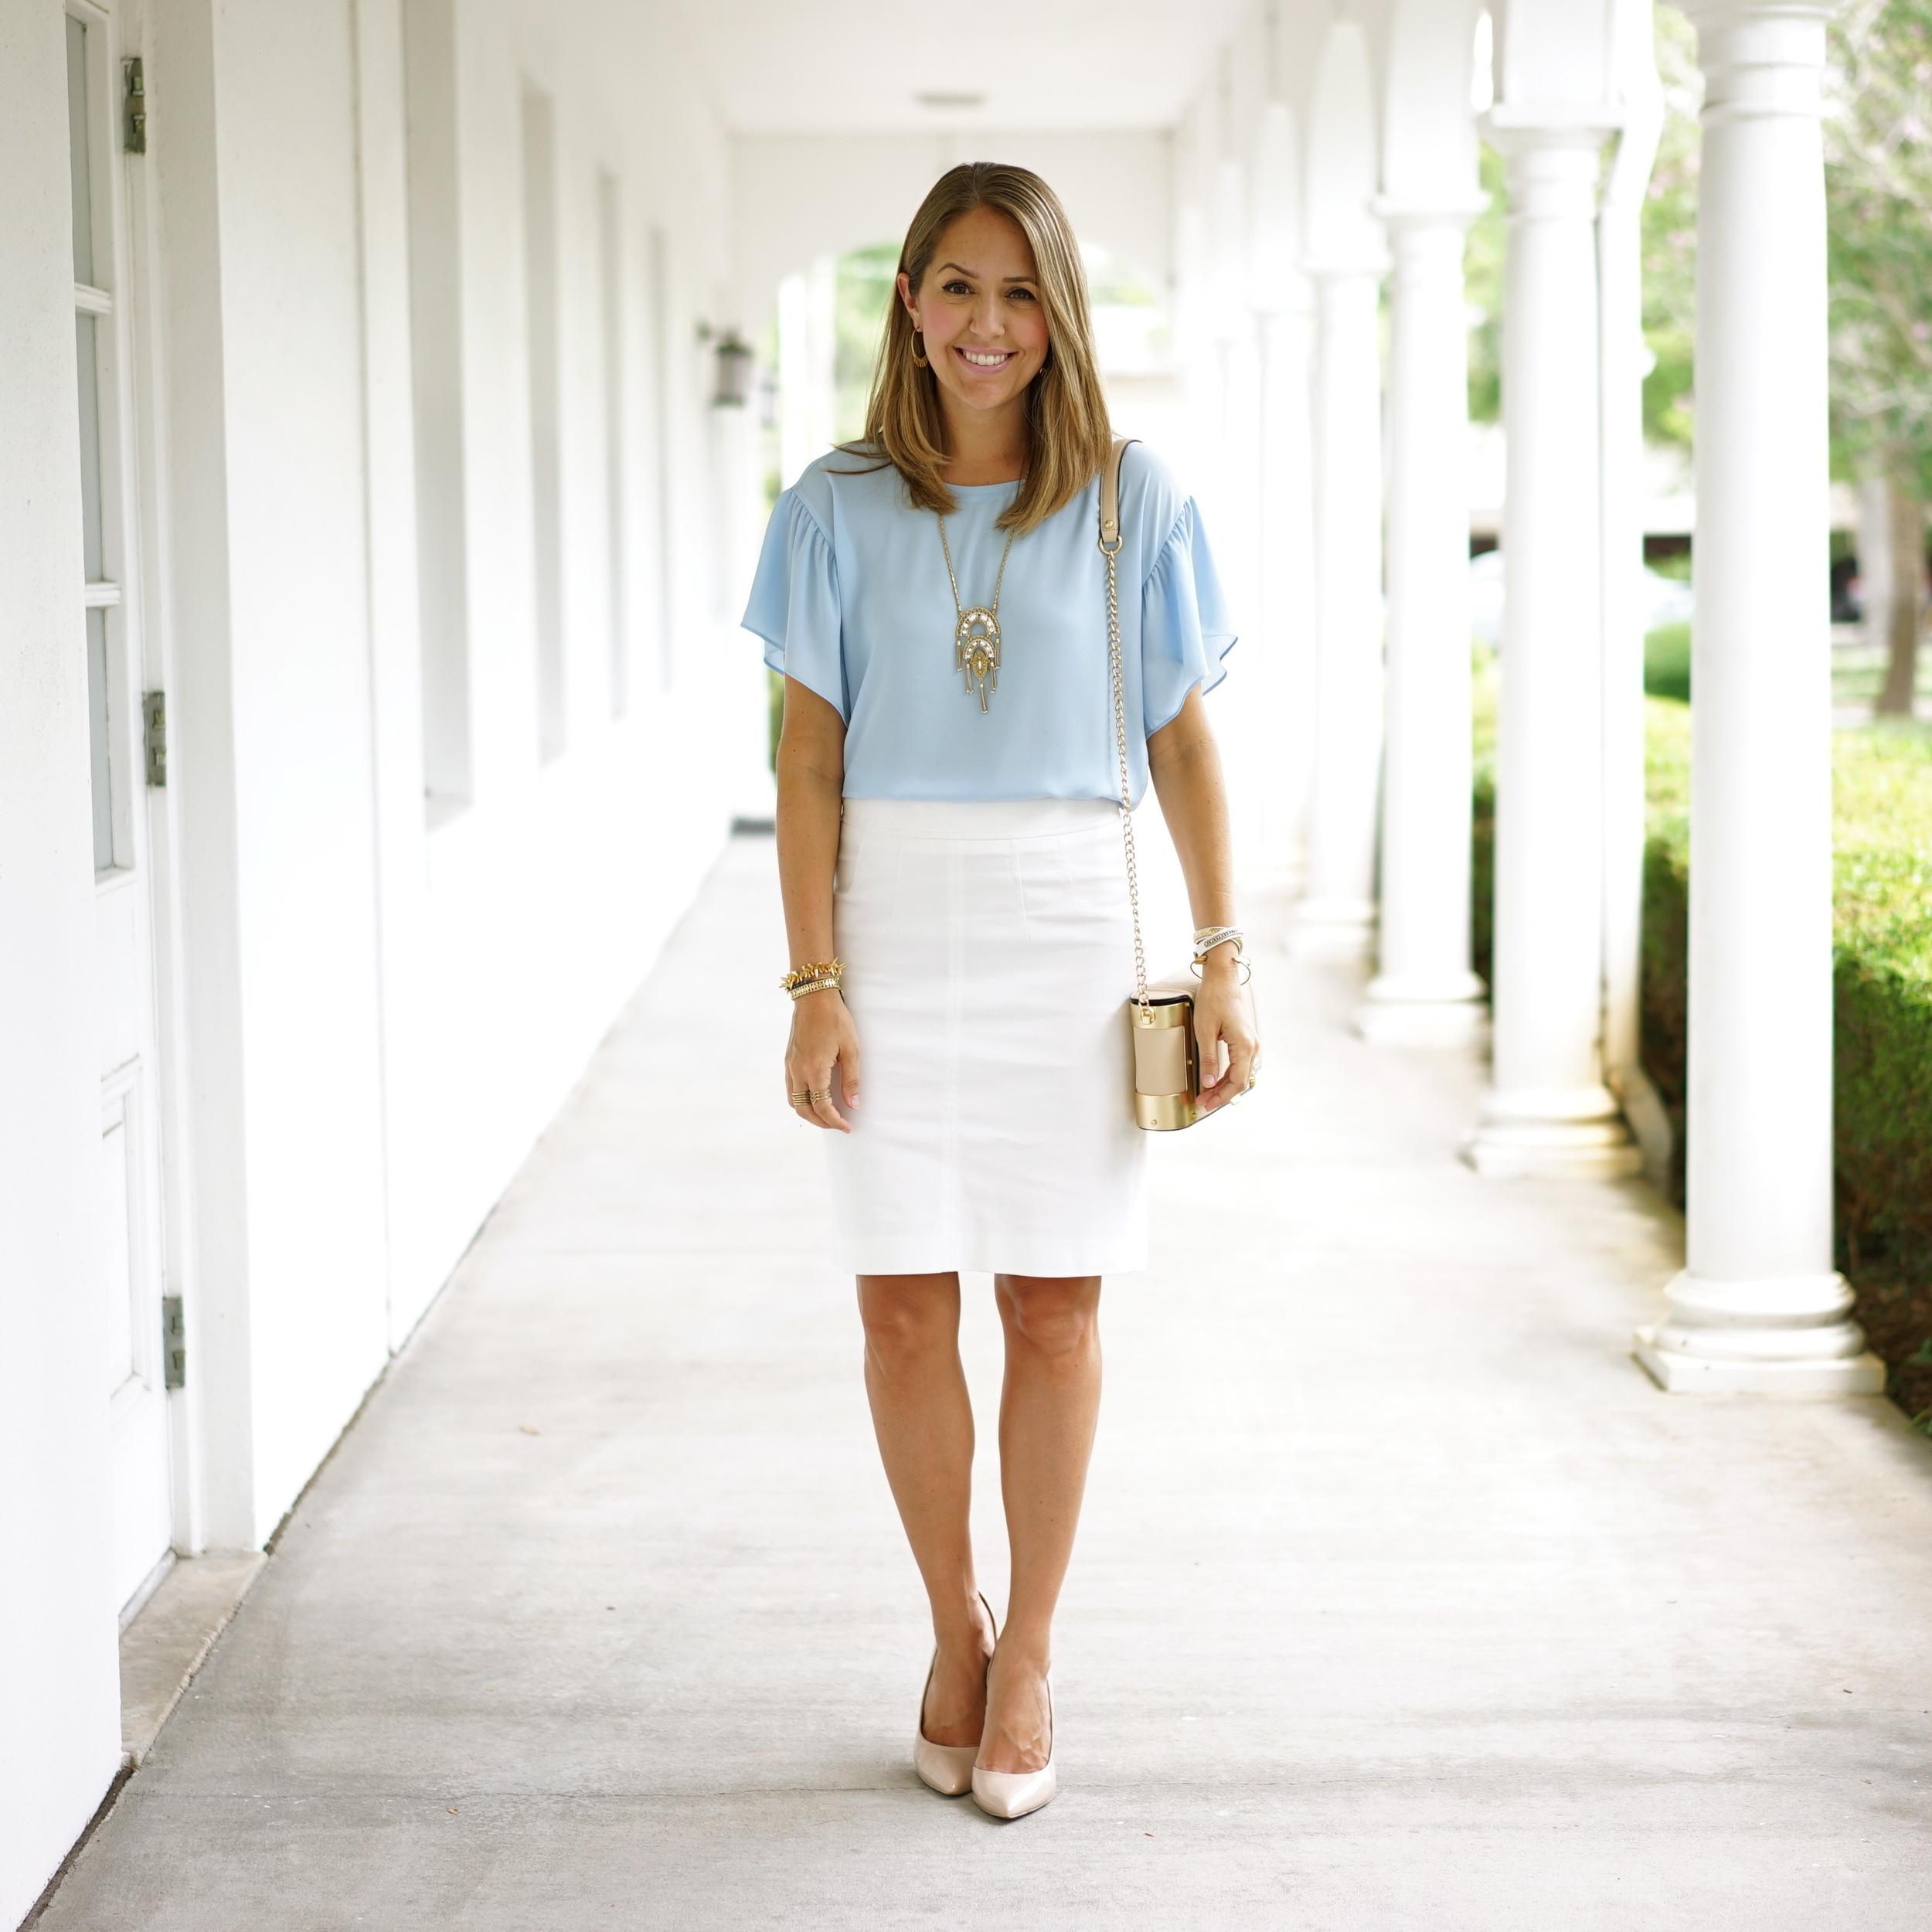 Baby blue ruffle sleeve top, white pencil skirt